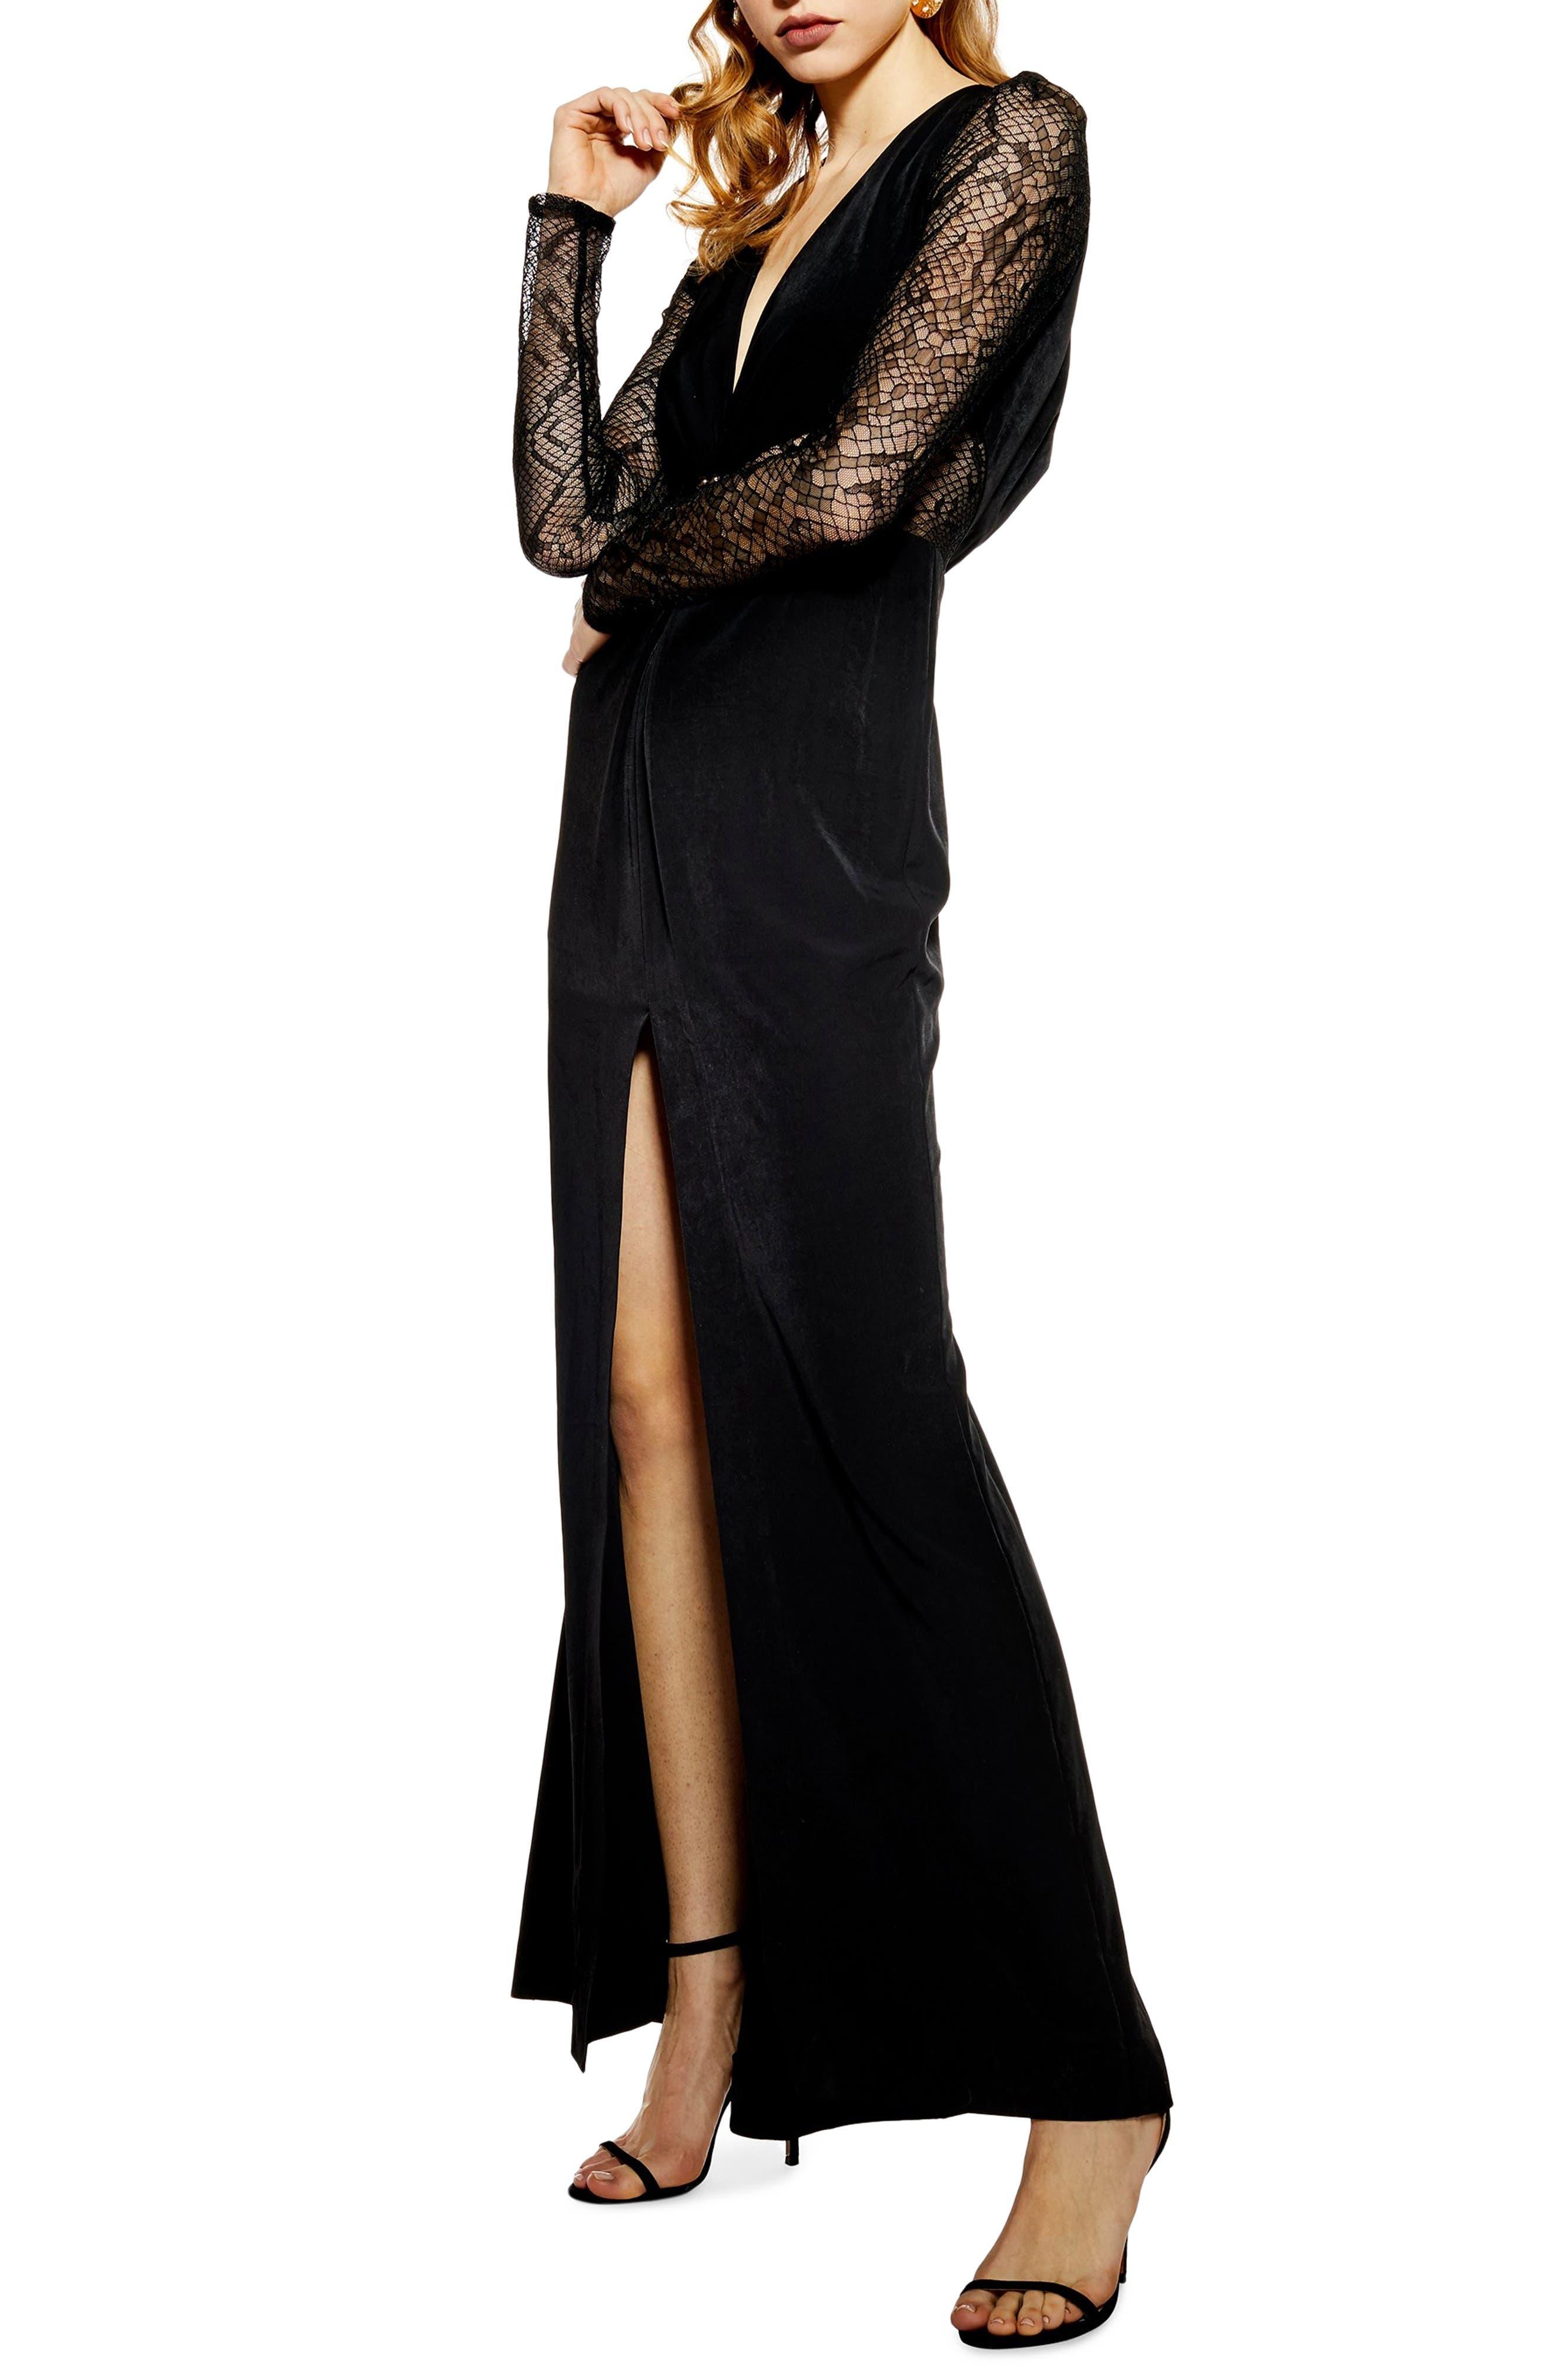 Topshop Long Lace Sleeve Maxi Dress, US (fits like 0-2) - Black